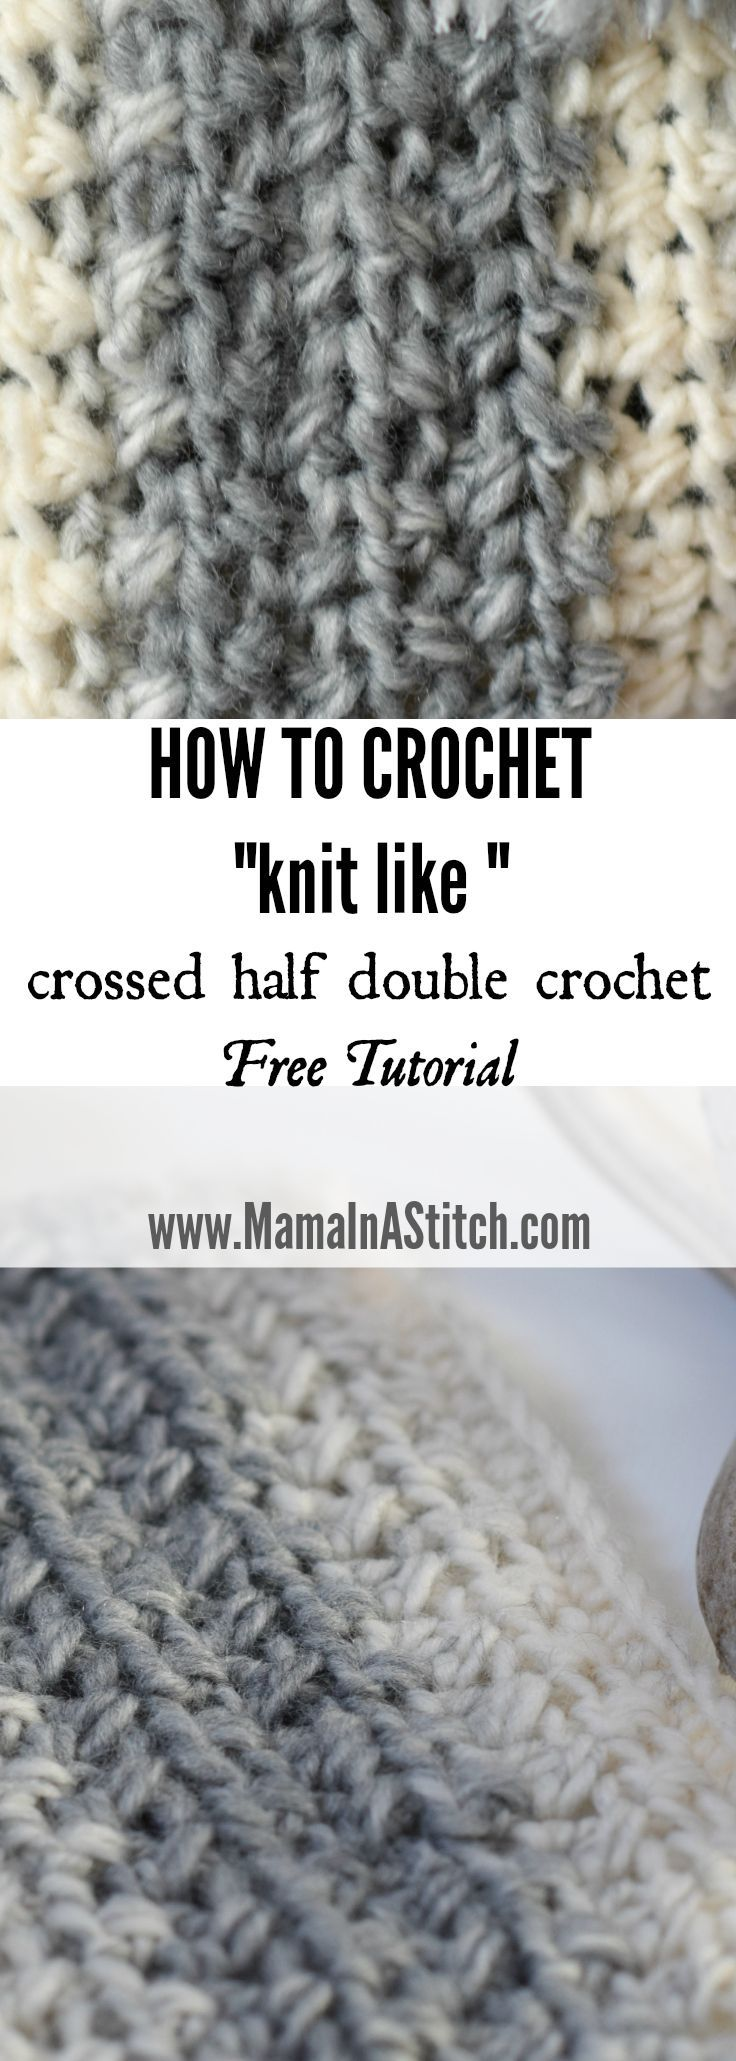 53 best I don\'t sew... images on Pinterest | Crochet patterns ...